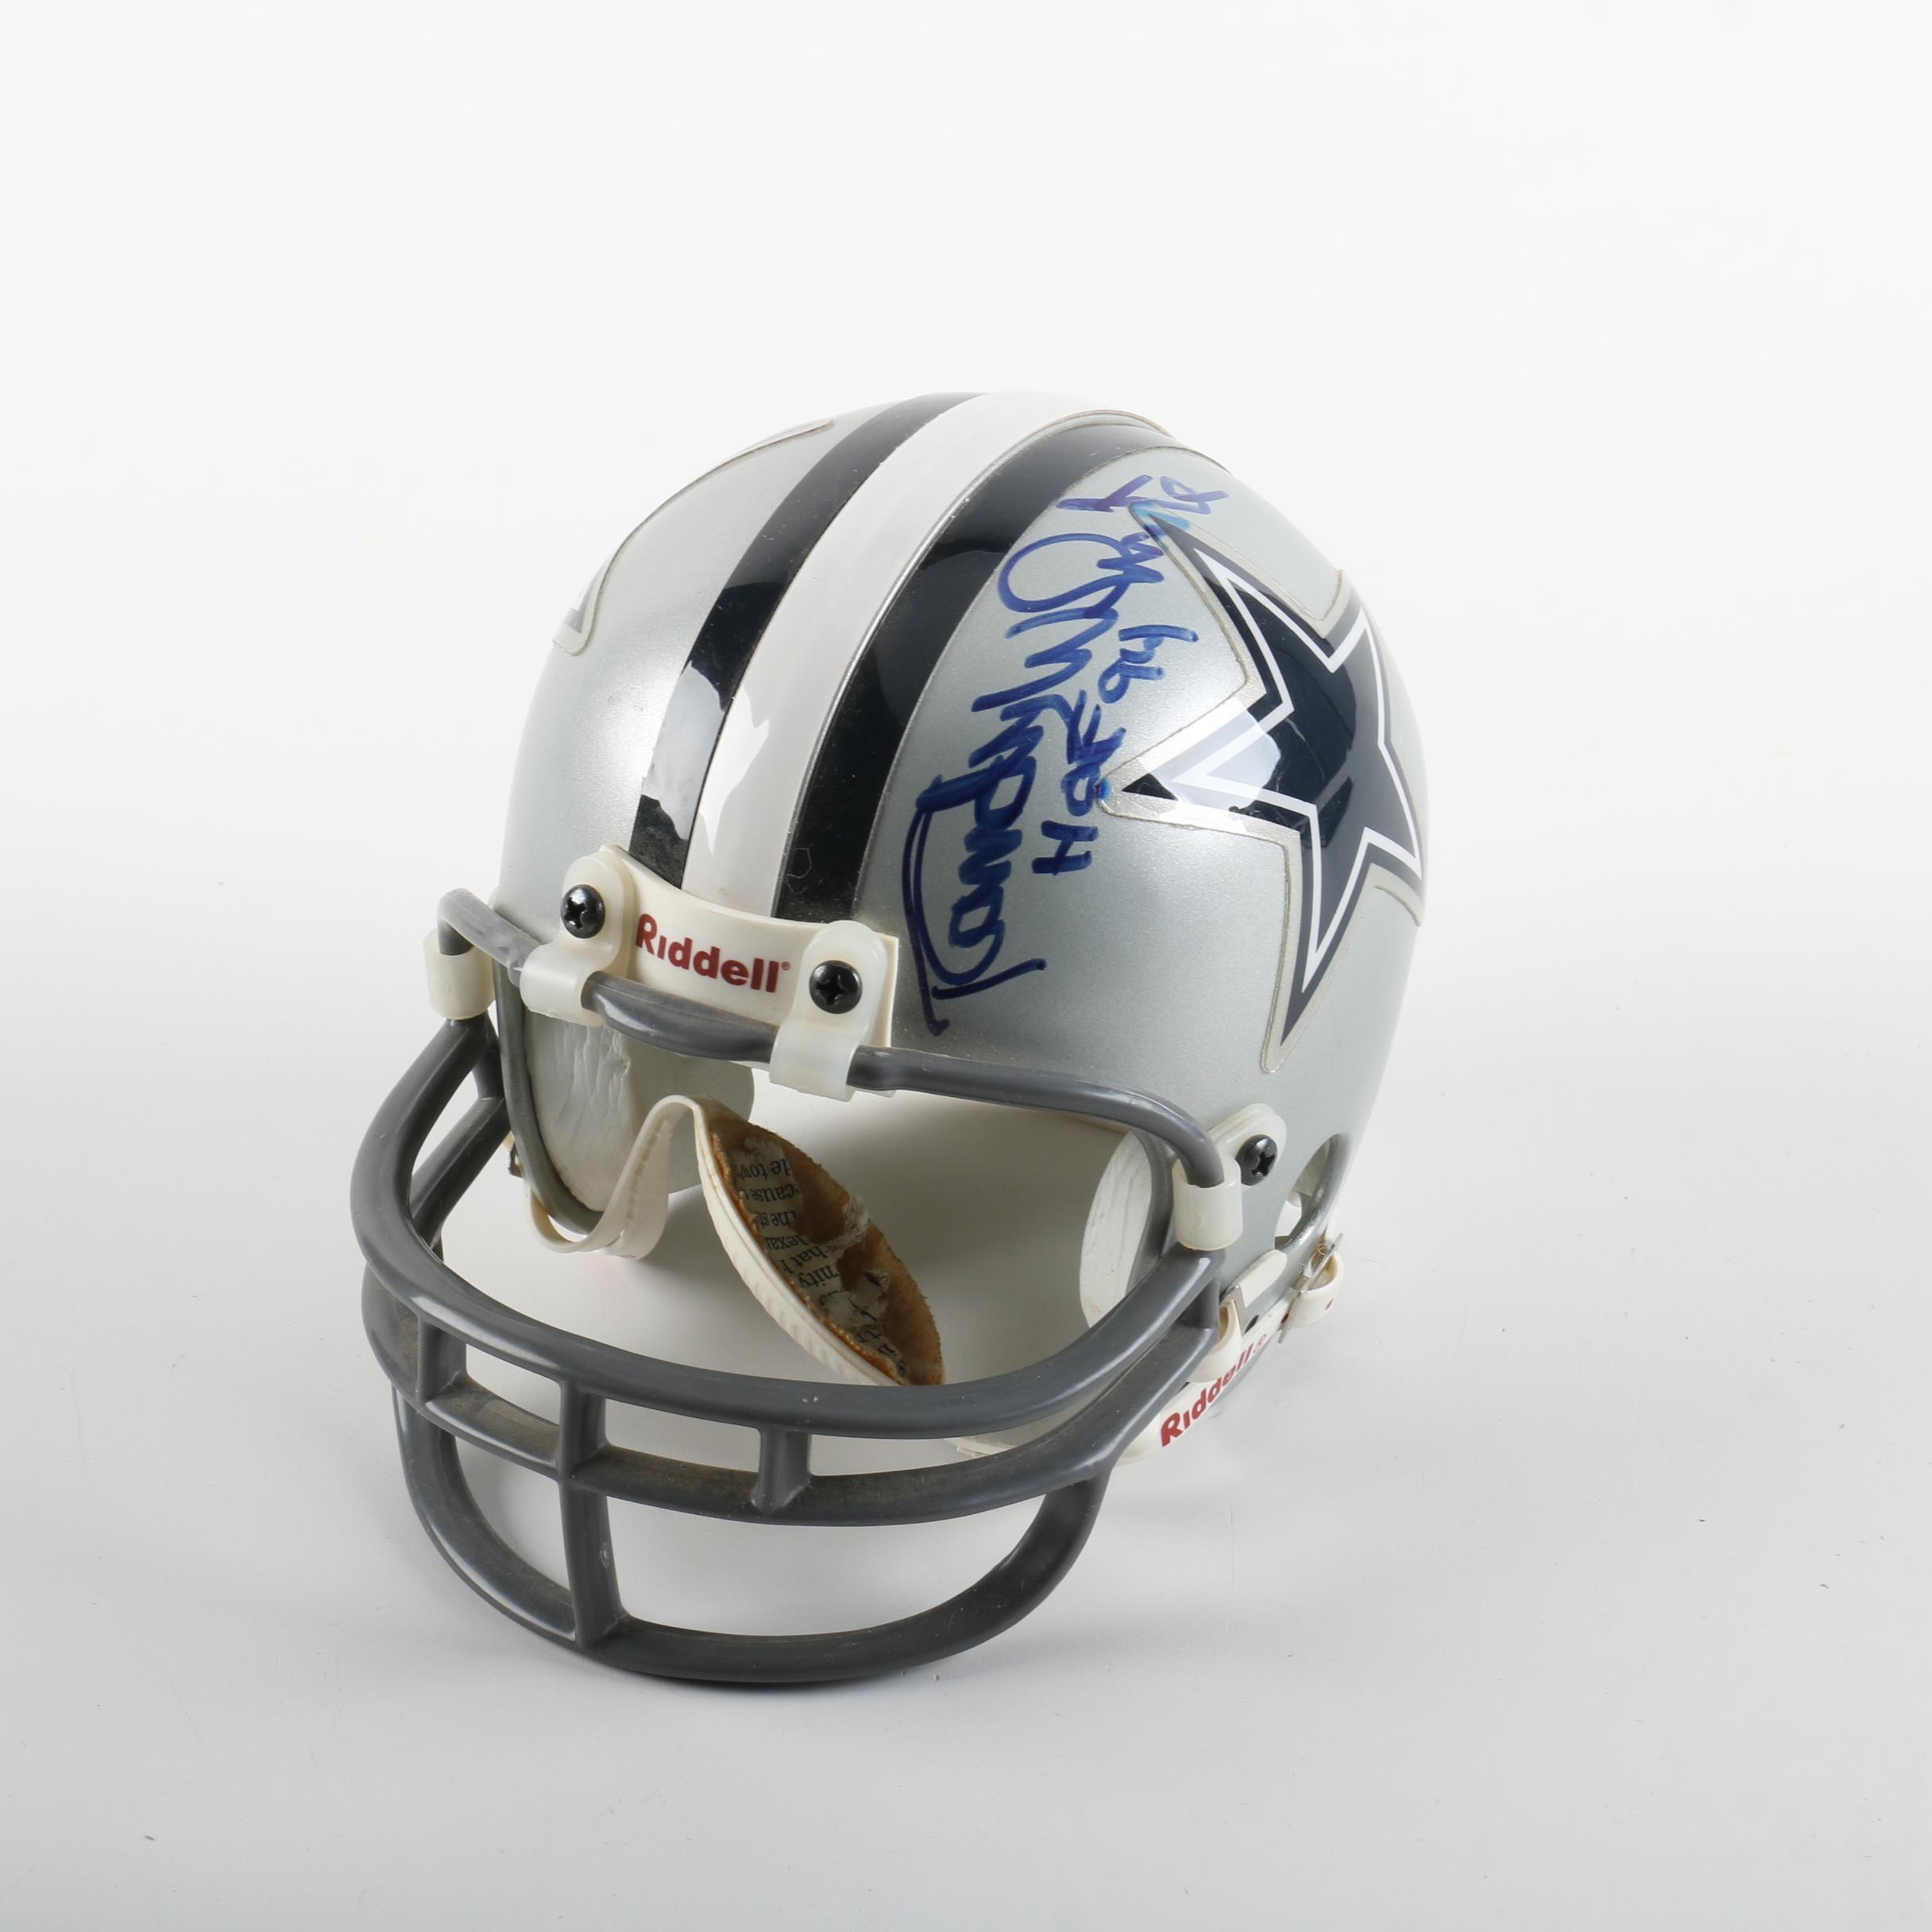 Randy White Autographed Mini-Helmet